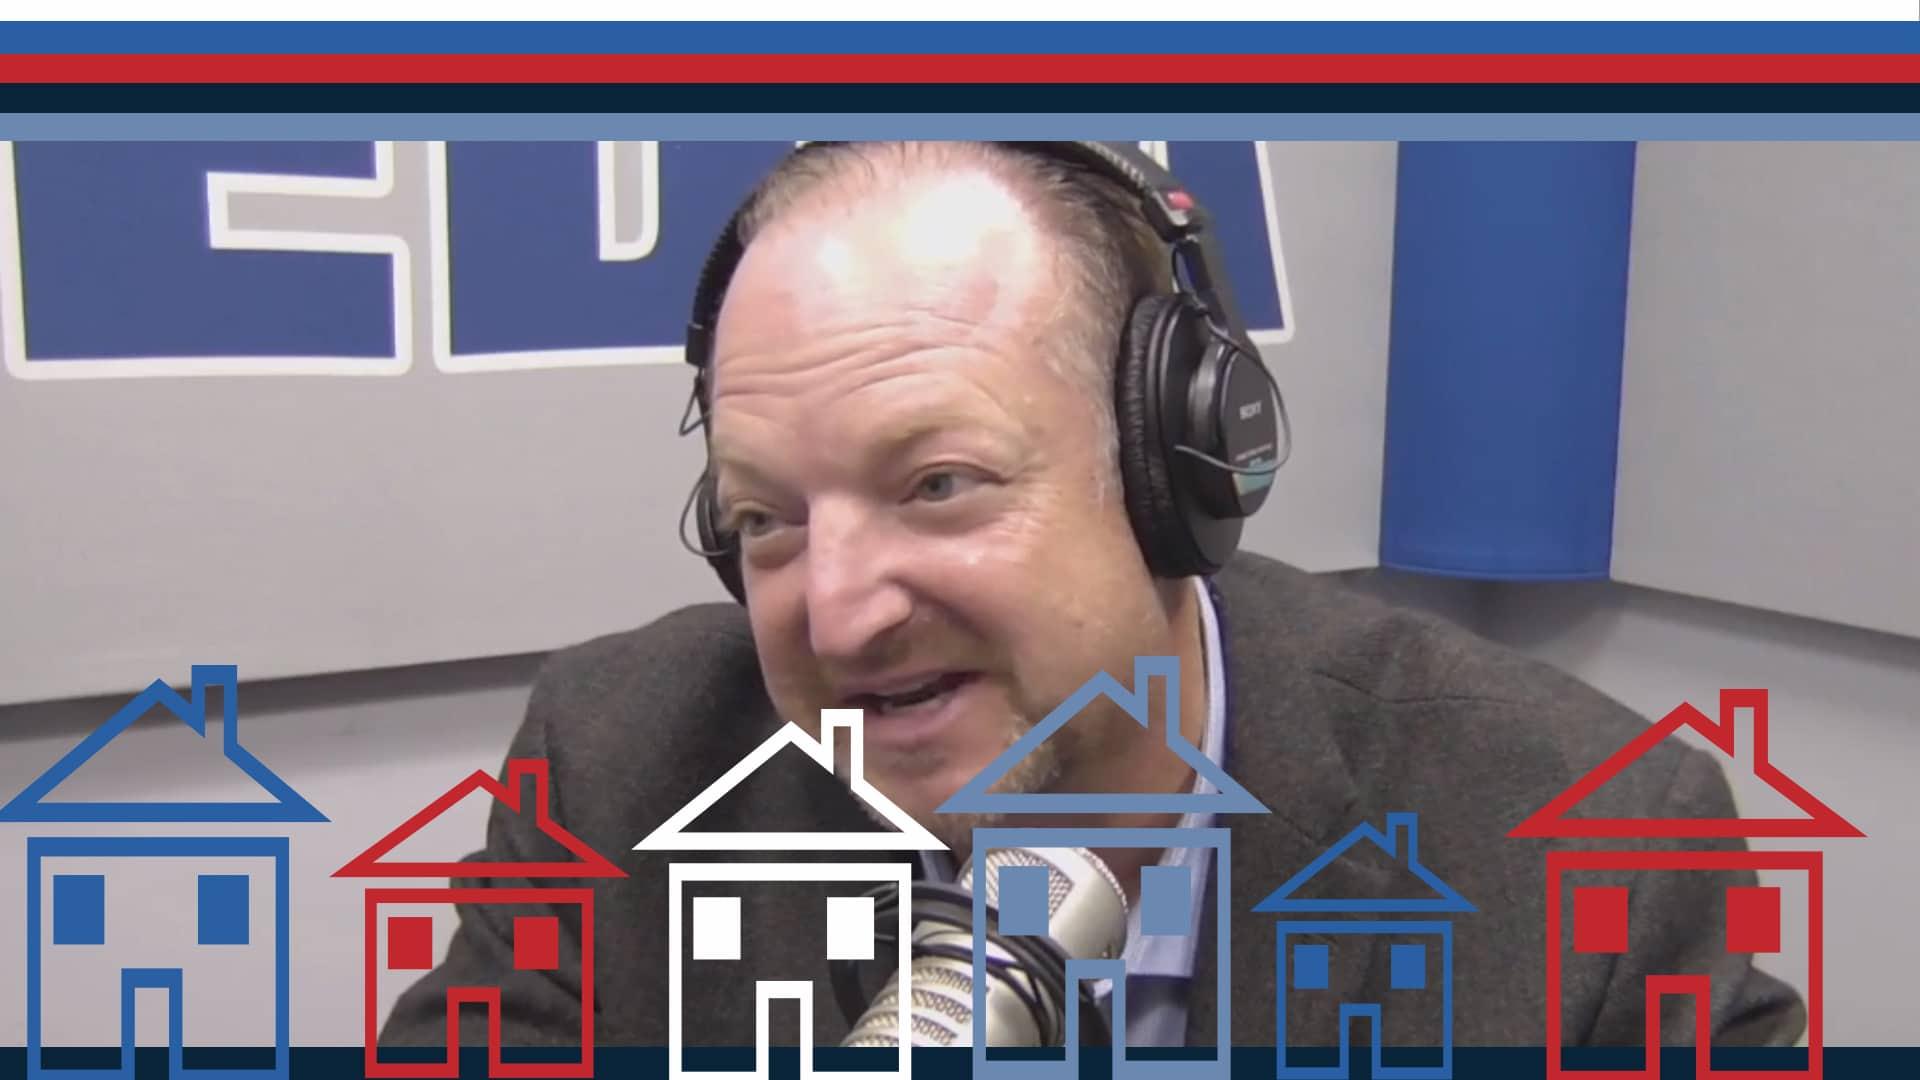 Real Estate Realities - Episode 22